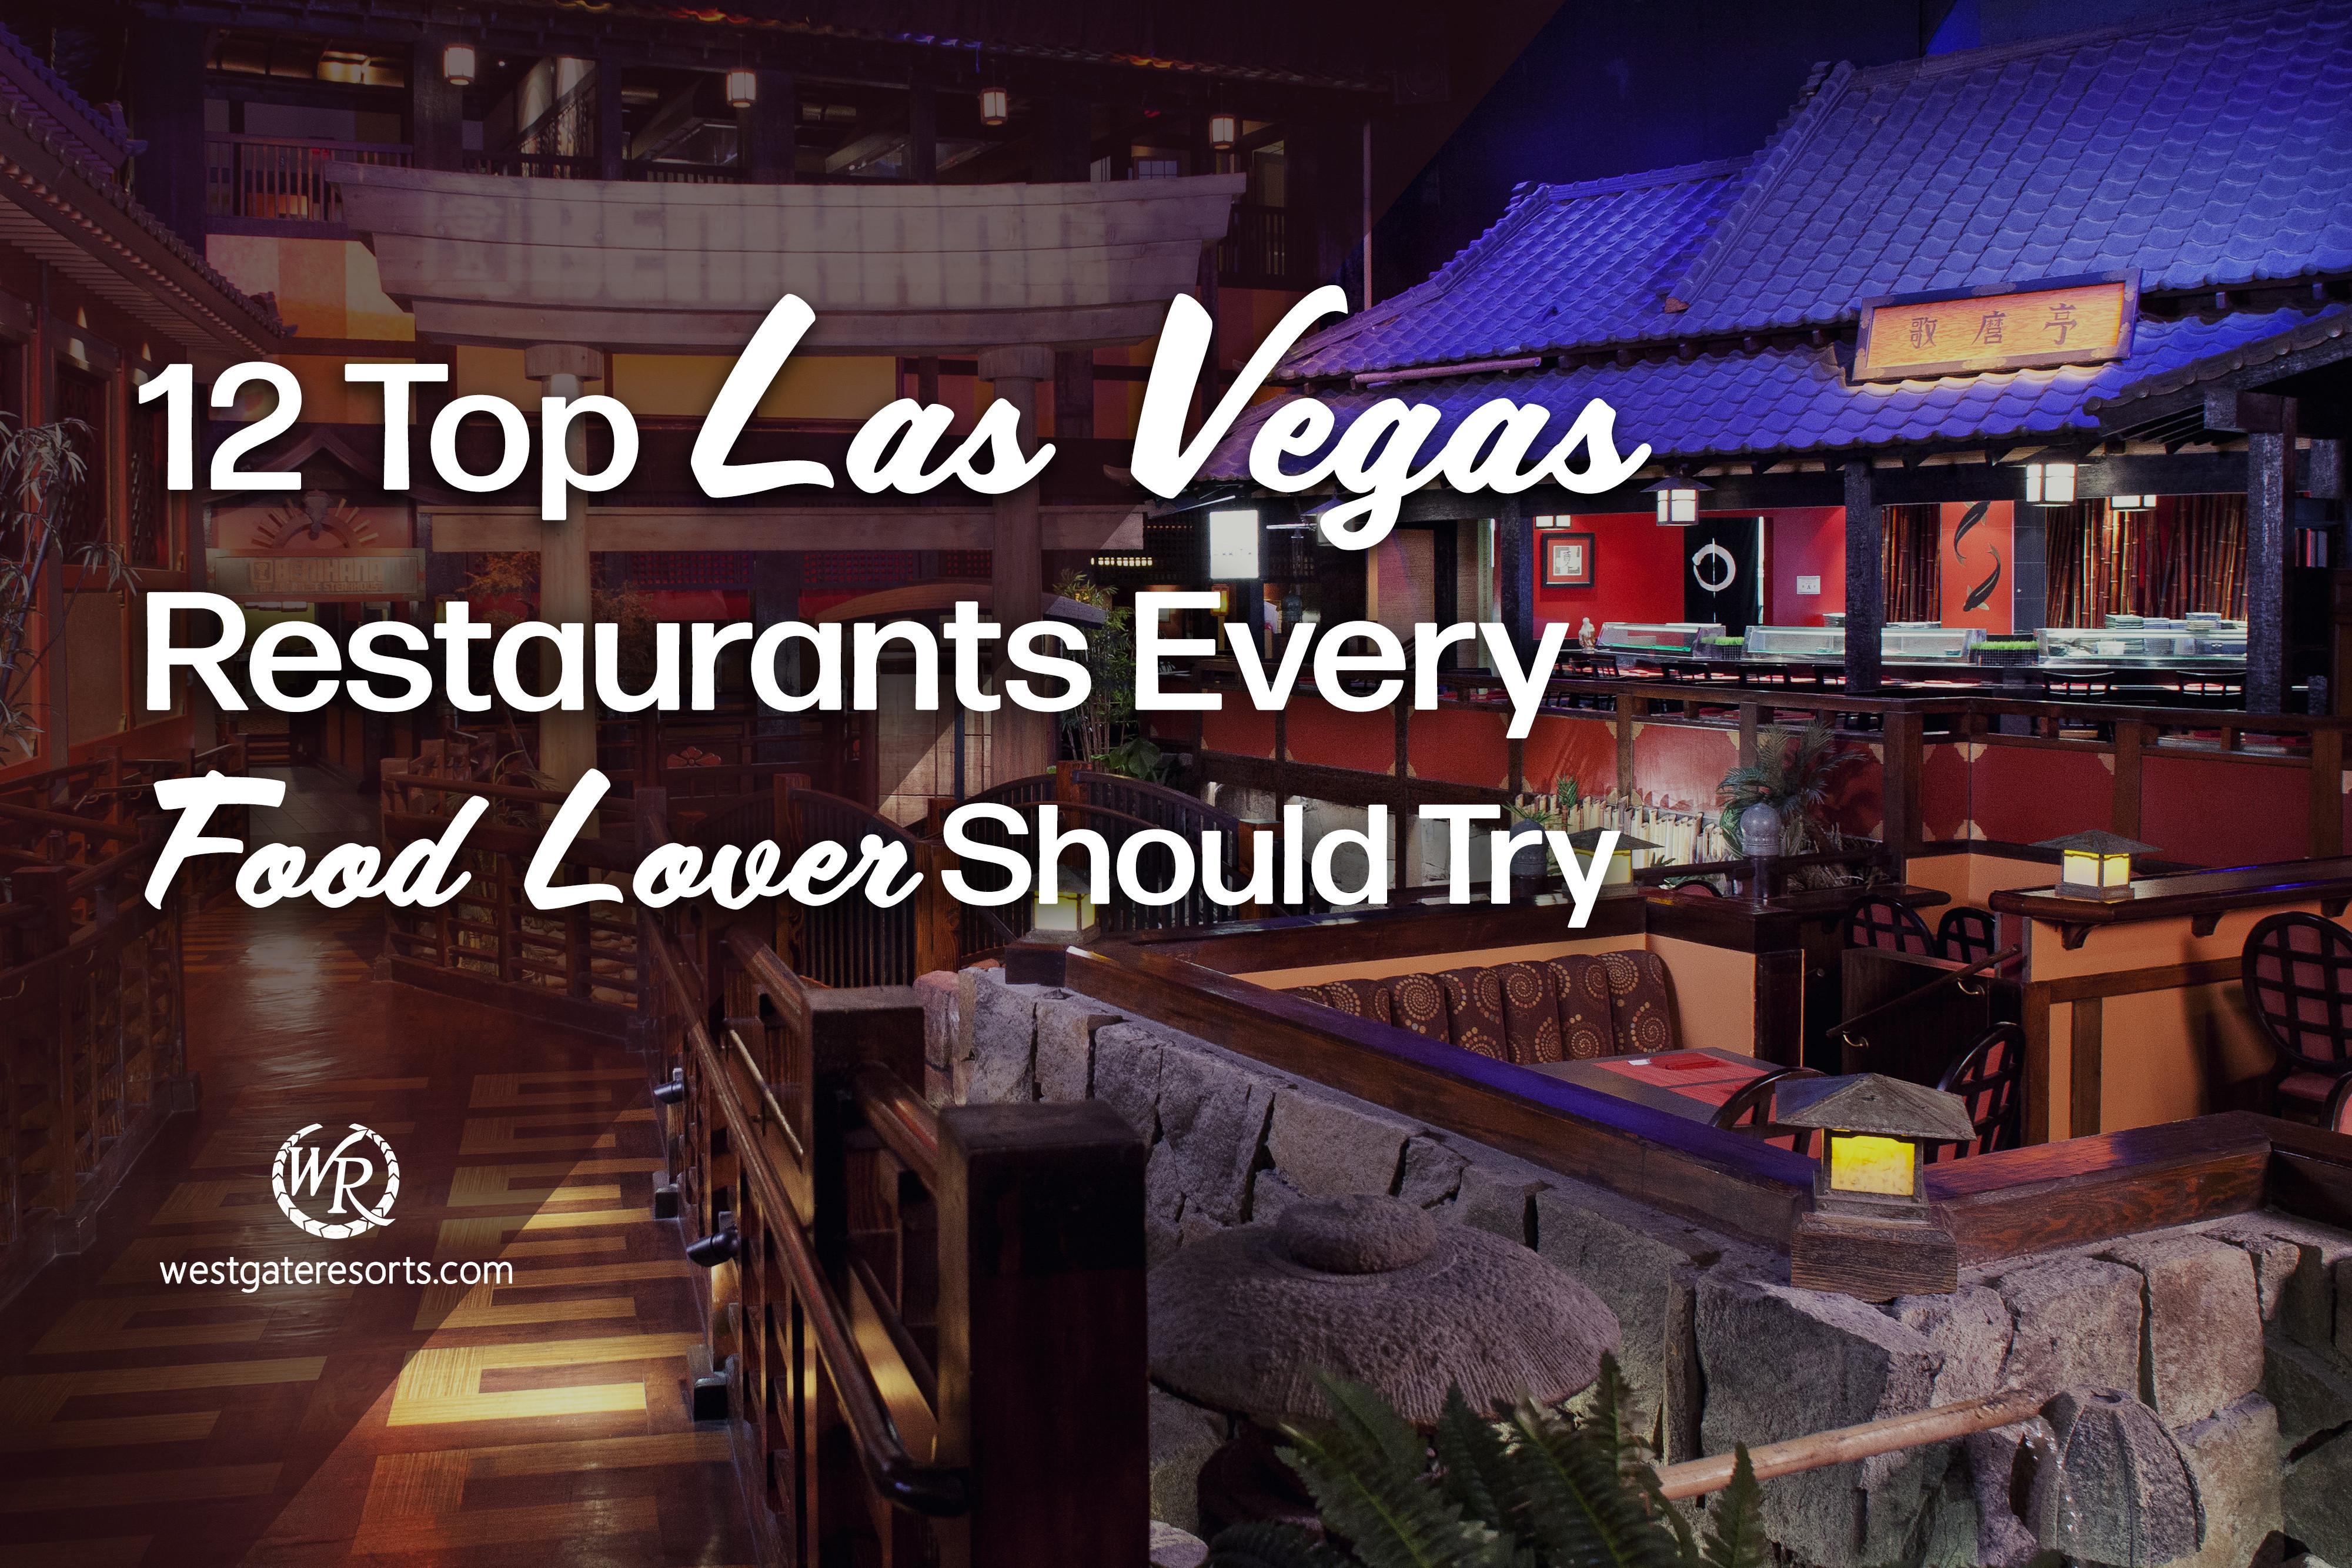 12 Top Las Vegas Restaurants Every Food Lover Should Try